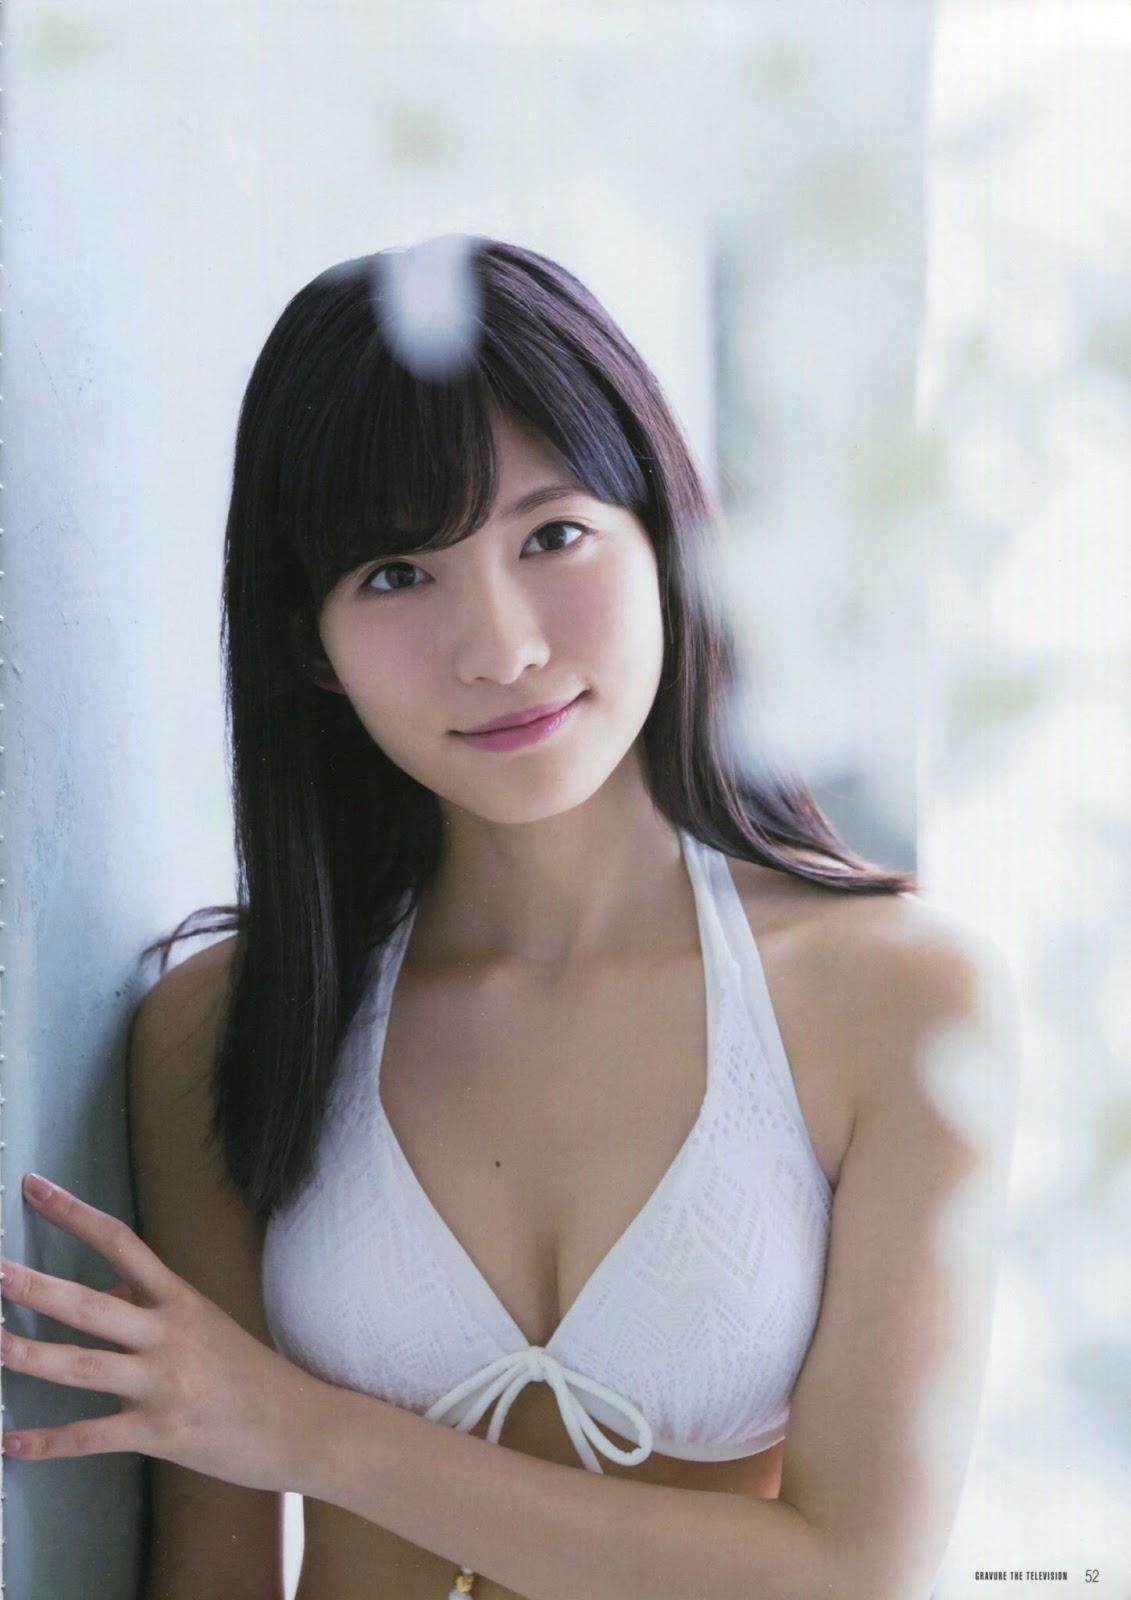 Taniguchi Megu 谷口めぐ, Gravure The Television Vol.48 (G(グラビア)ザテレビジョン) Vol.84)